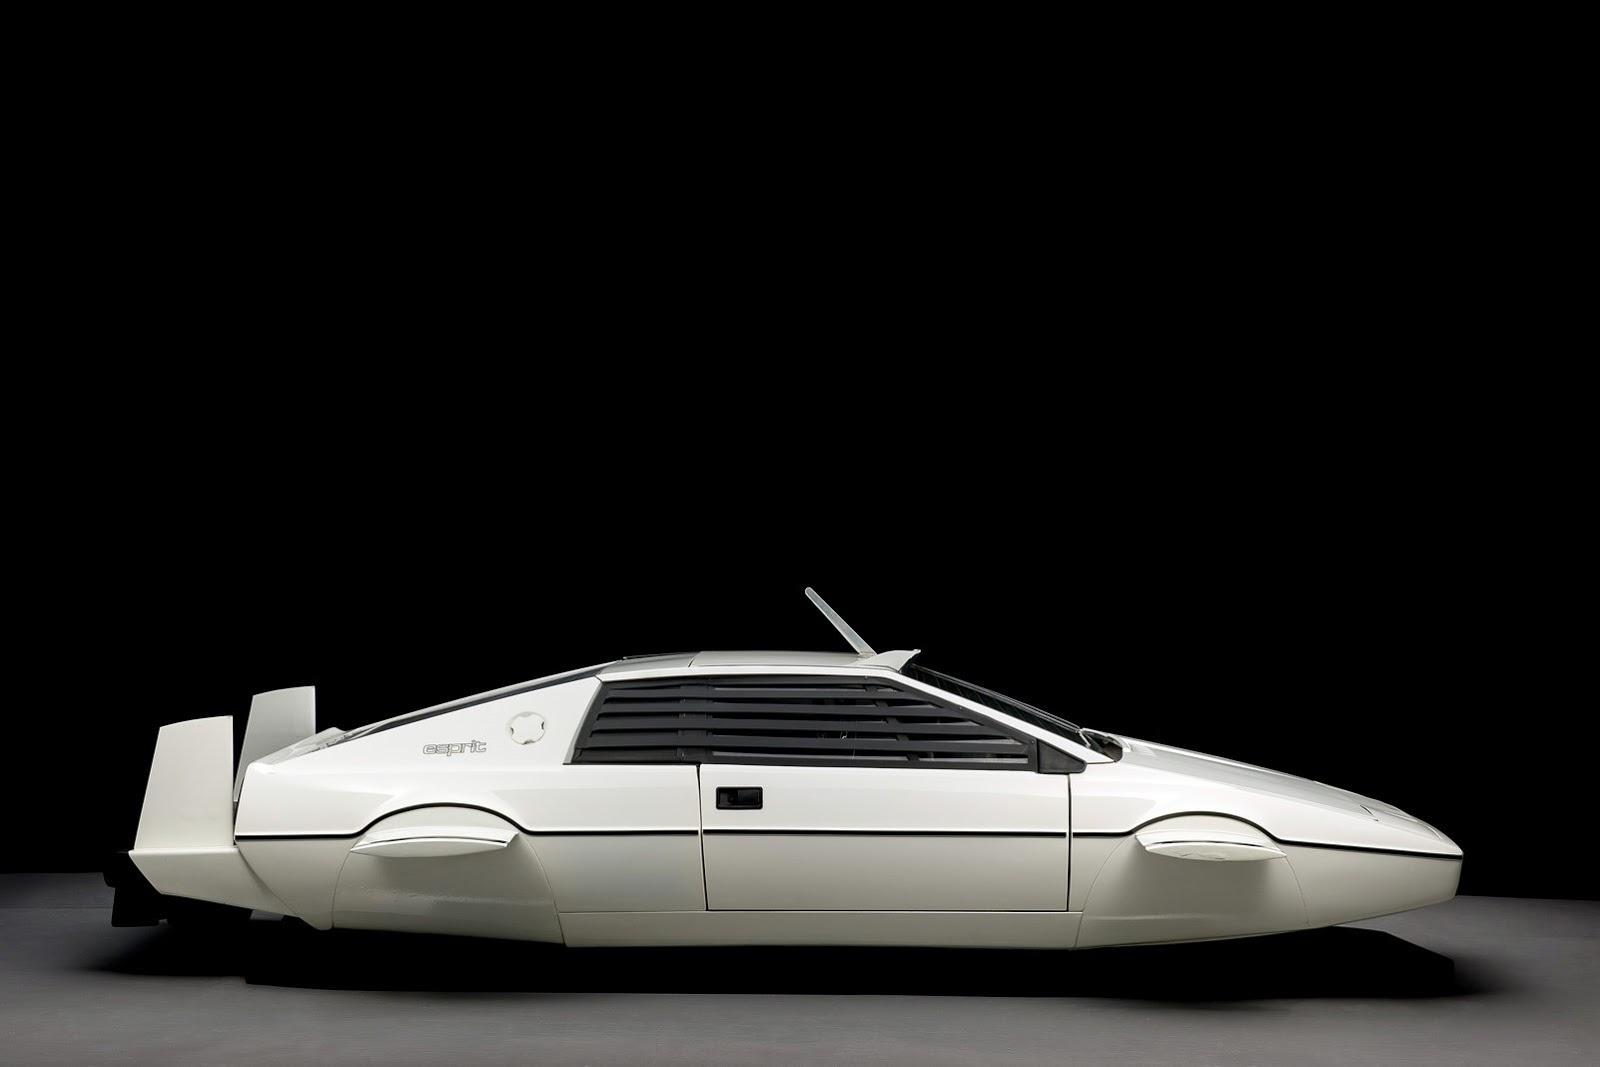 1977-lotus-esprit-submarine-james-bond-6